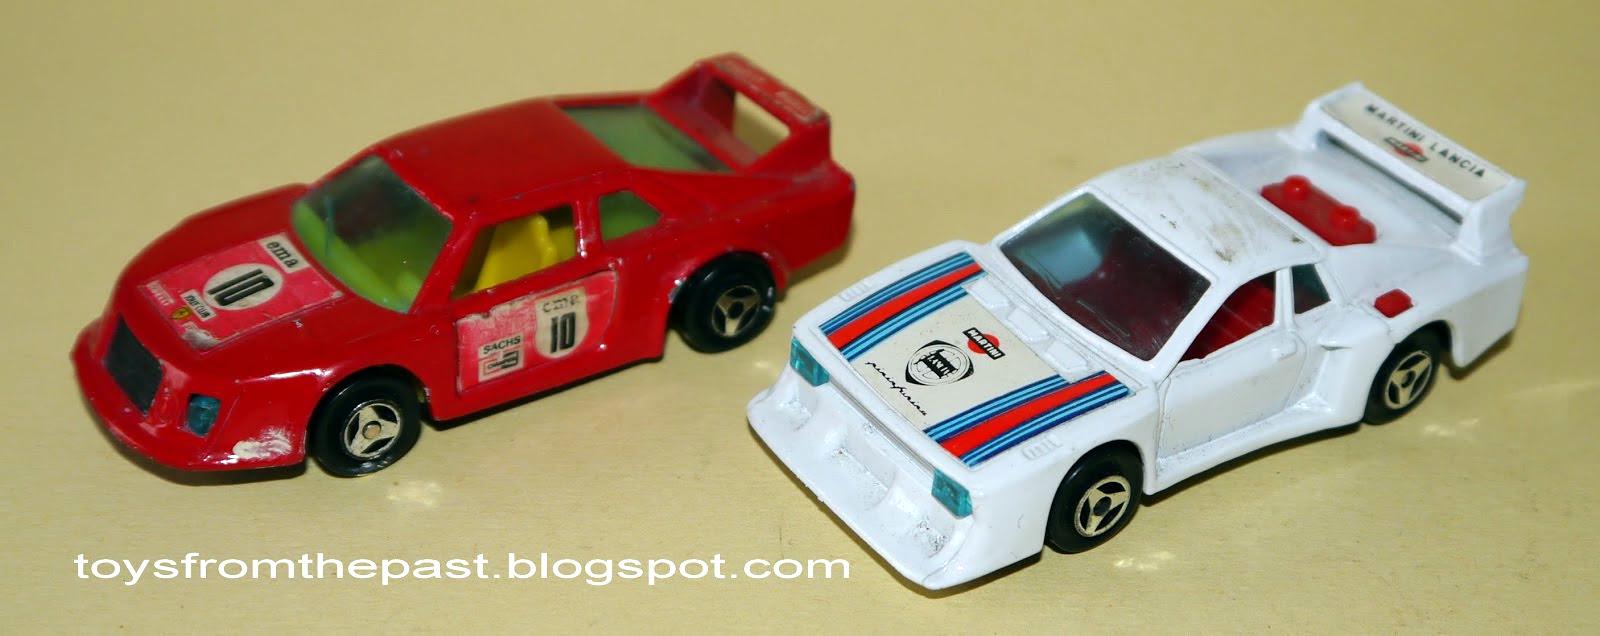 RN8 Ferrari 308 GTB e RN14 lancia Beta rally (cc-by-nc-nd 3.0 toysfromthepast)